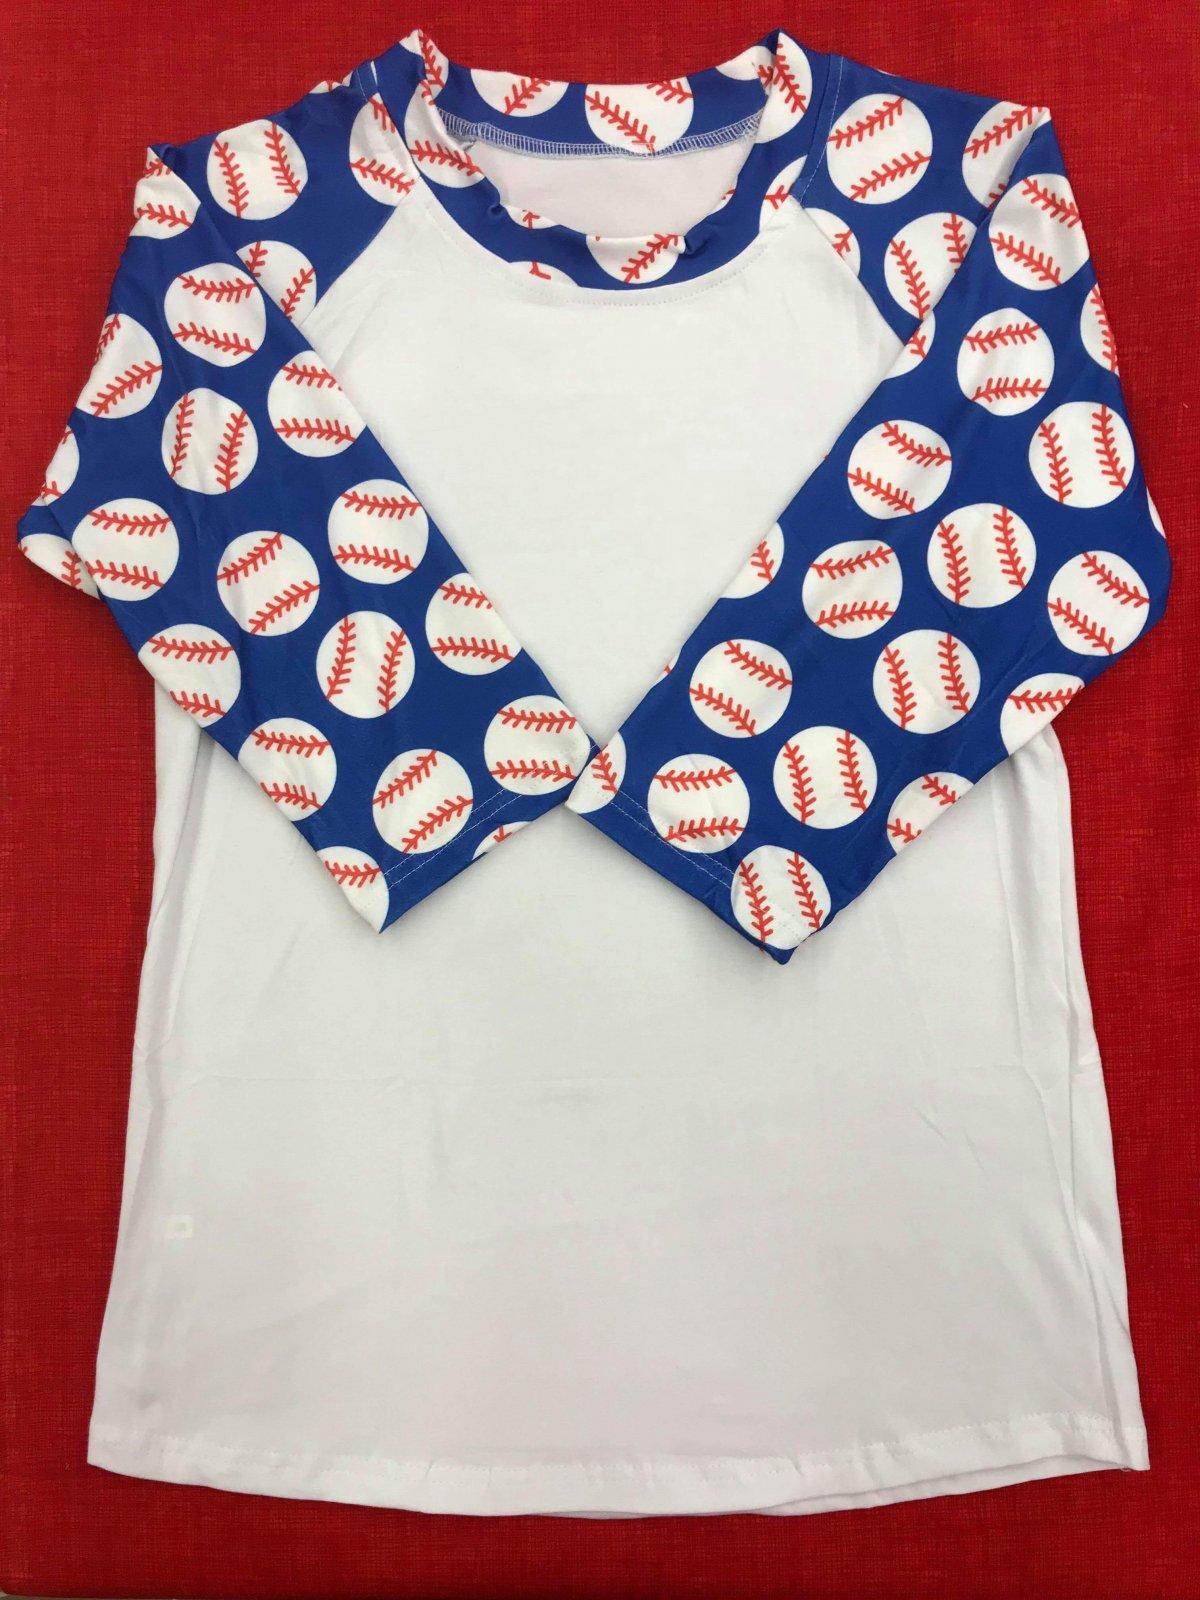 Blue Baseball Sleeve Adult Raglan